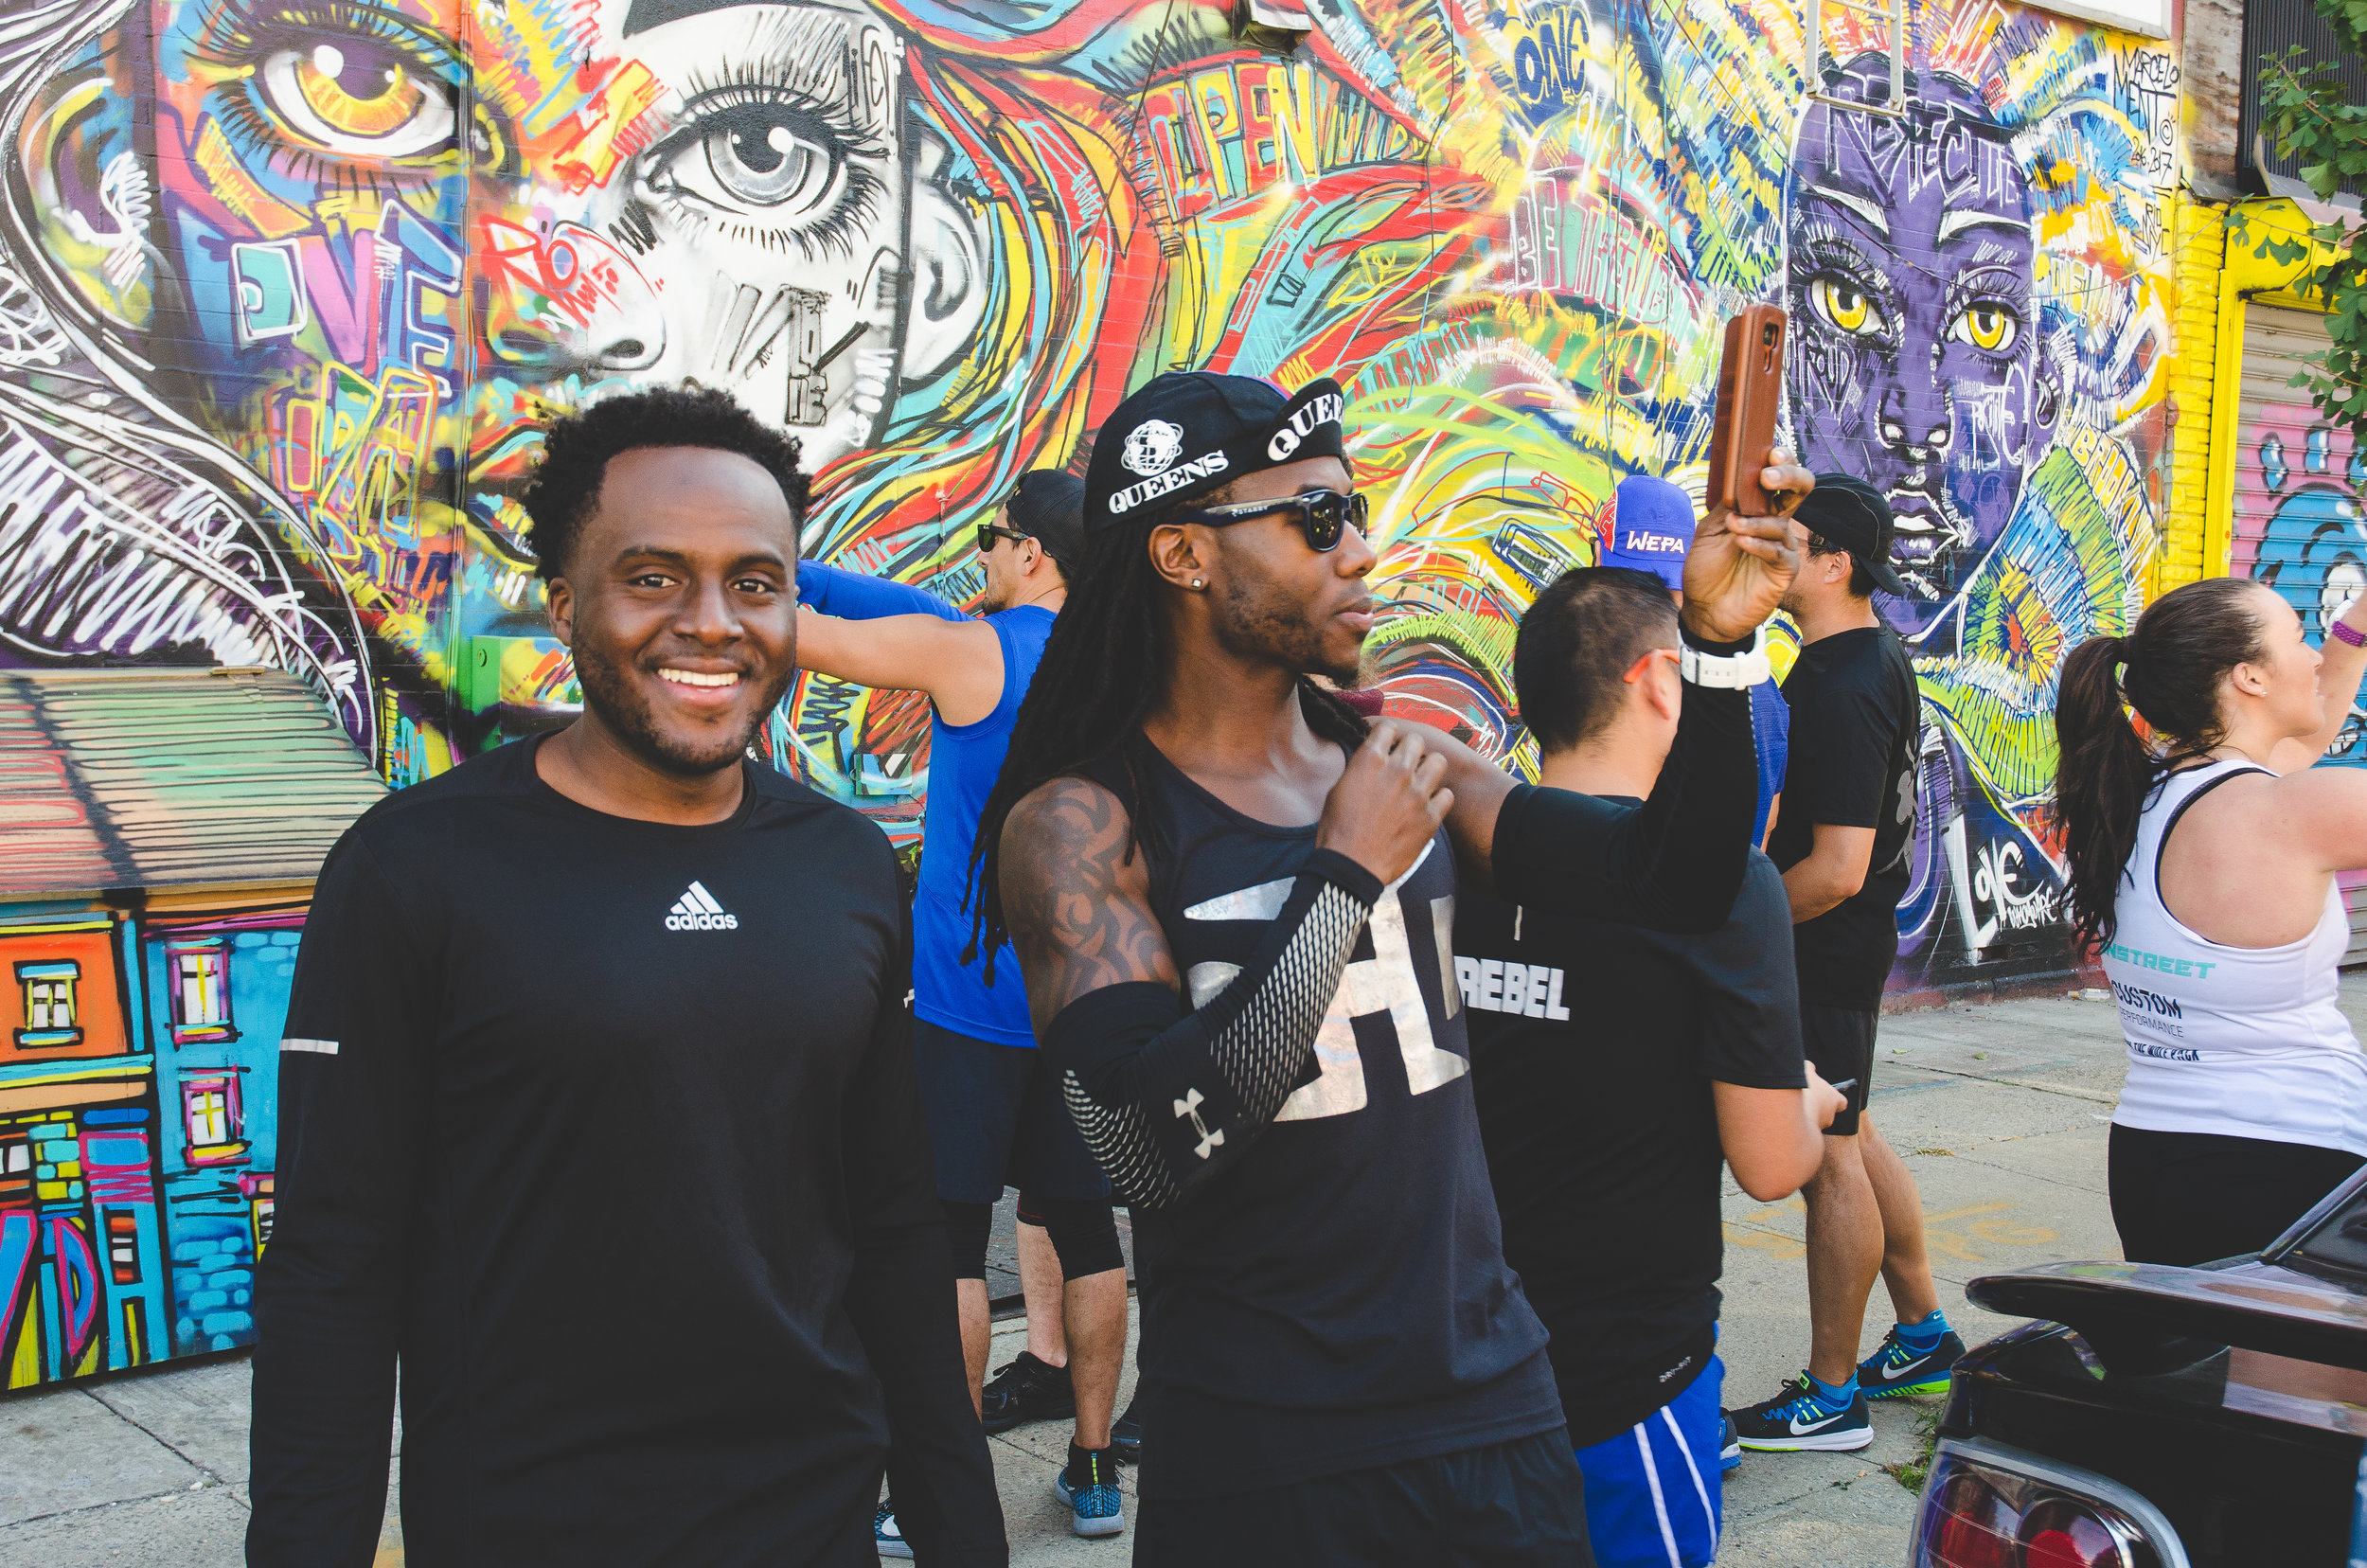 Runstreet X JMZ Walls Run 4 Puerto Rico-5705.jpg